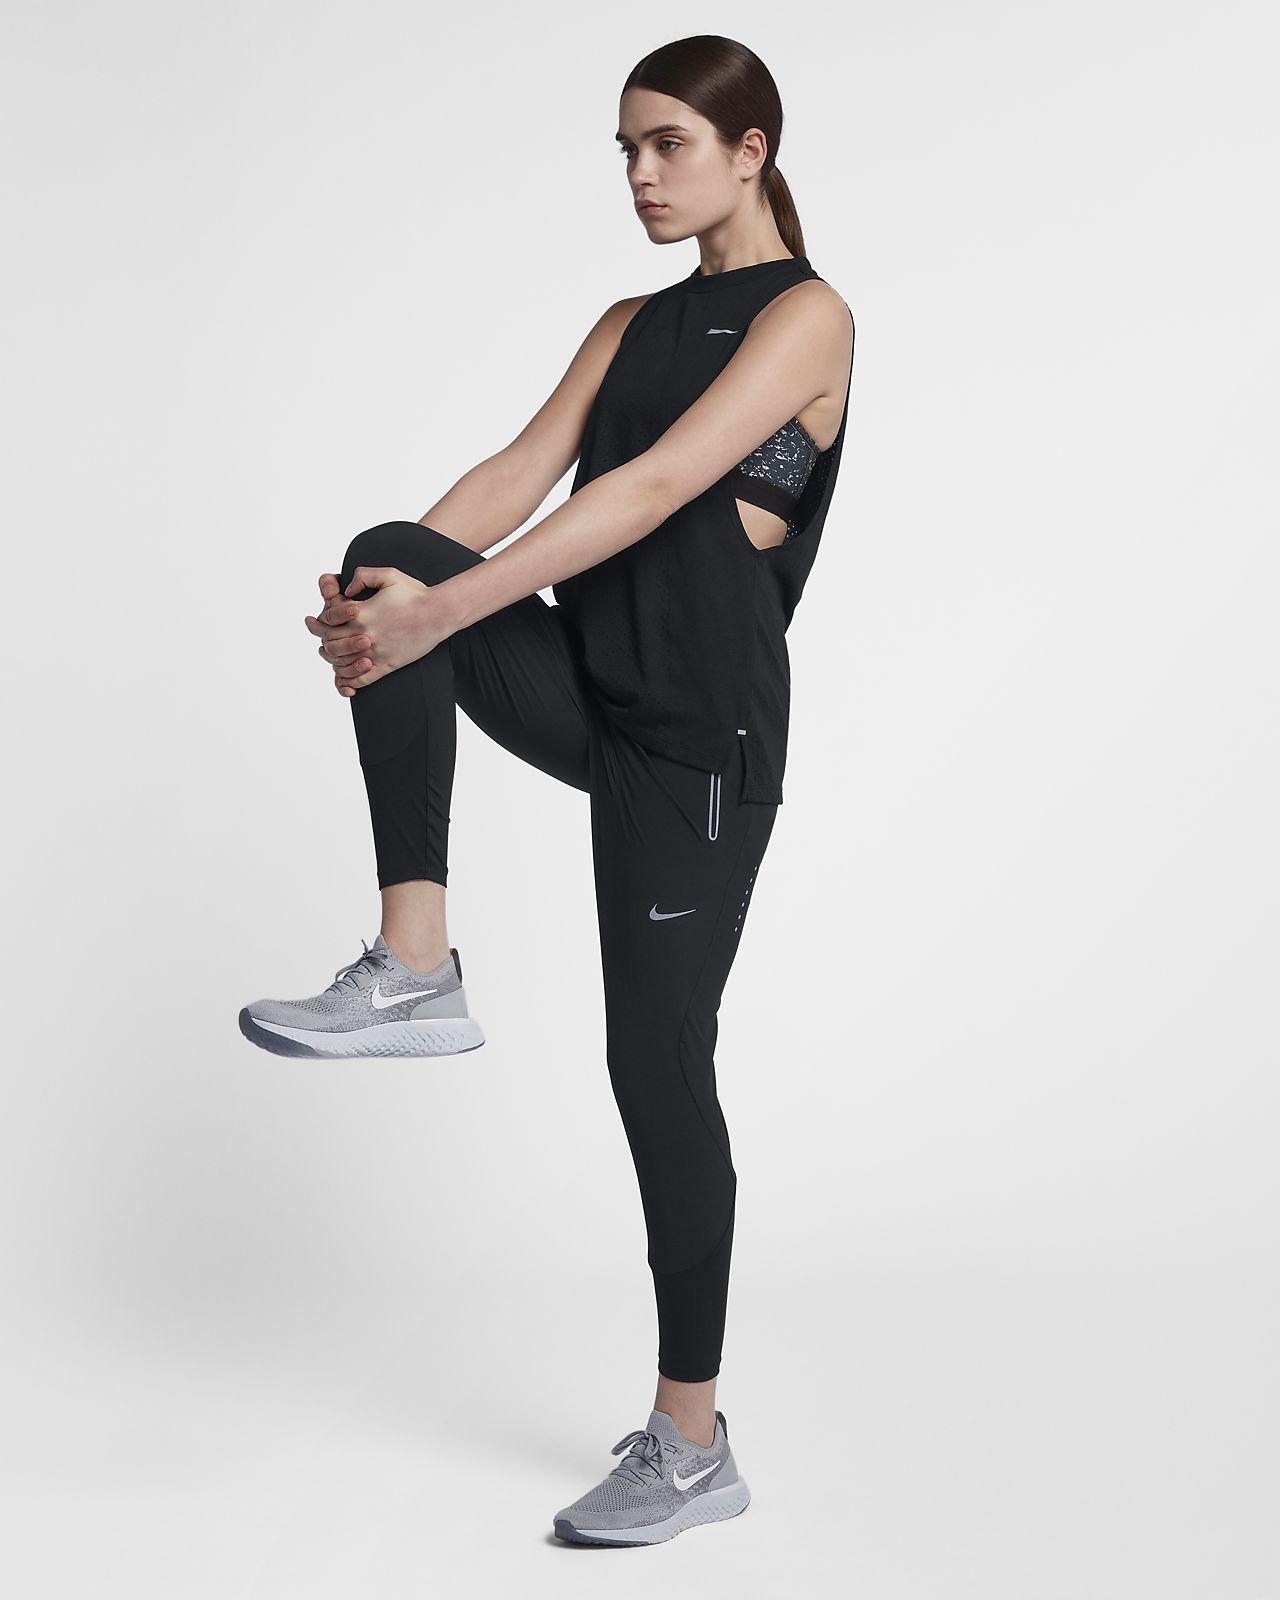 2ea2946f53 Canotta da running Nike Dri-FIT Tailwind - Donna. Nike.com IT